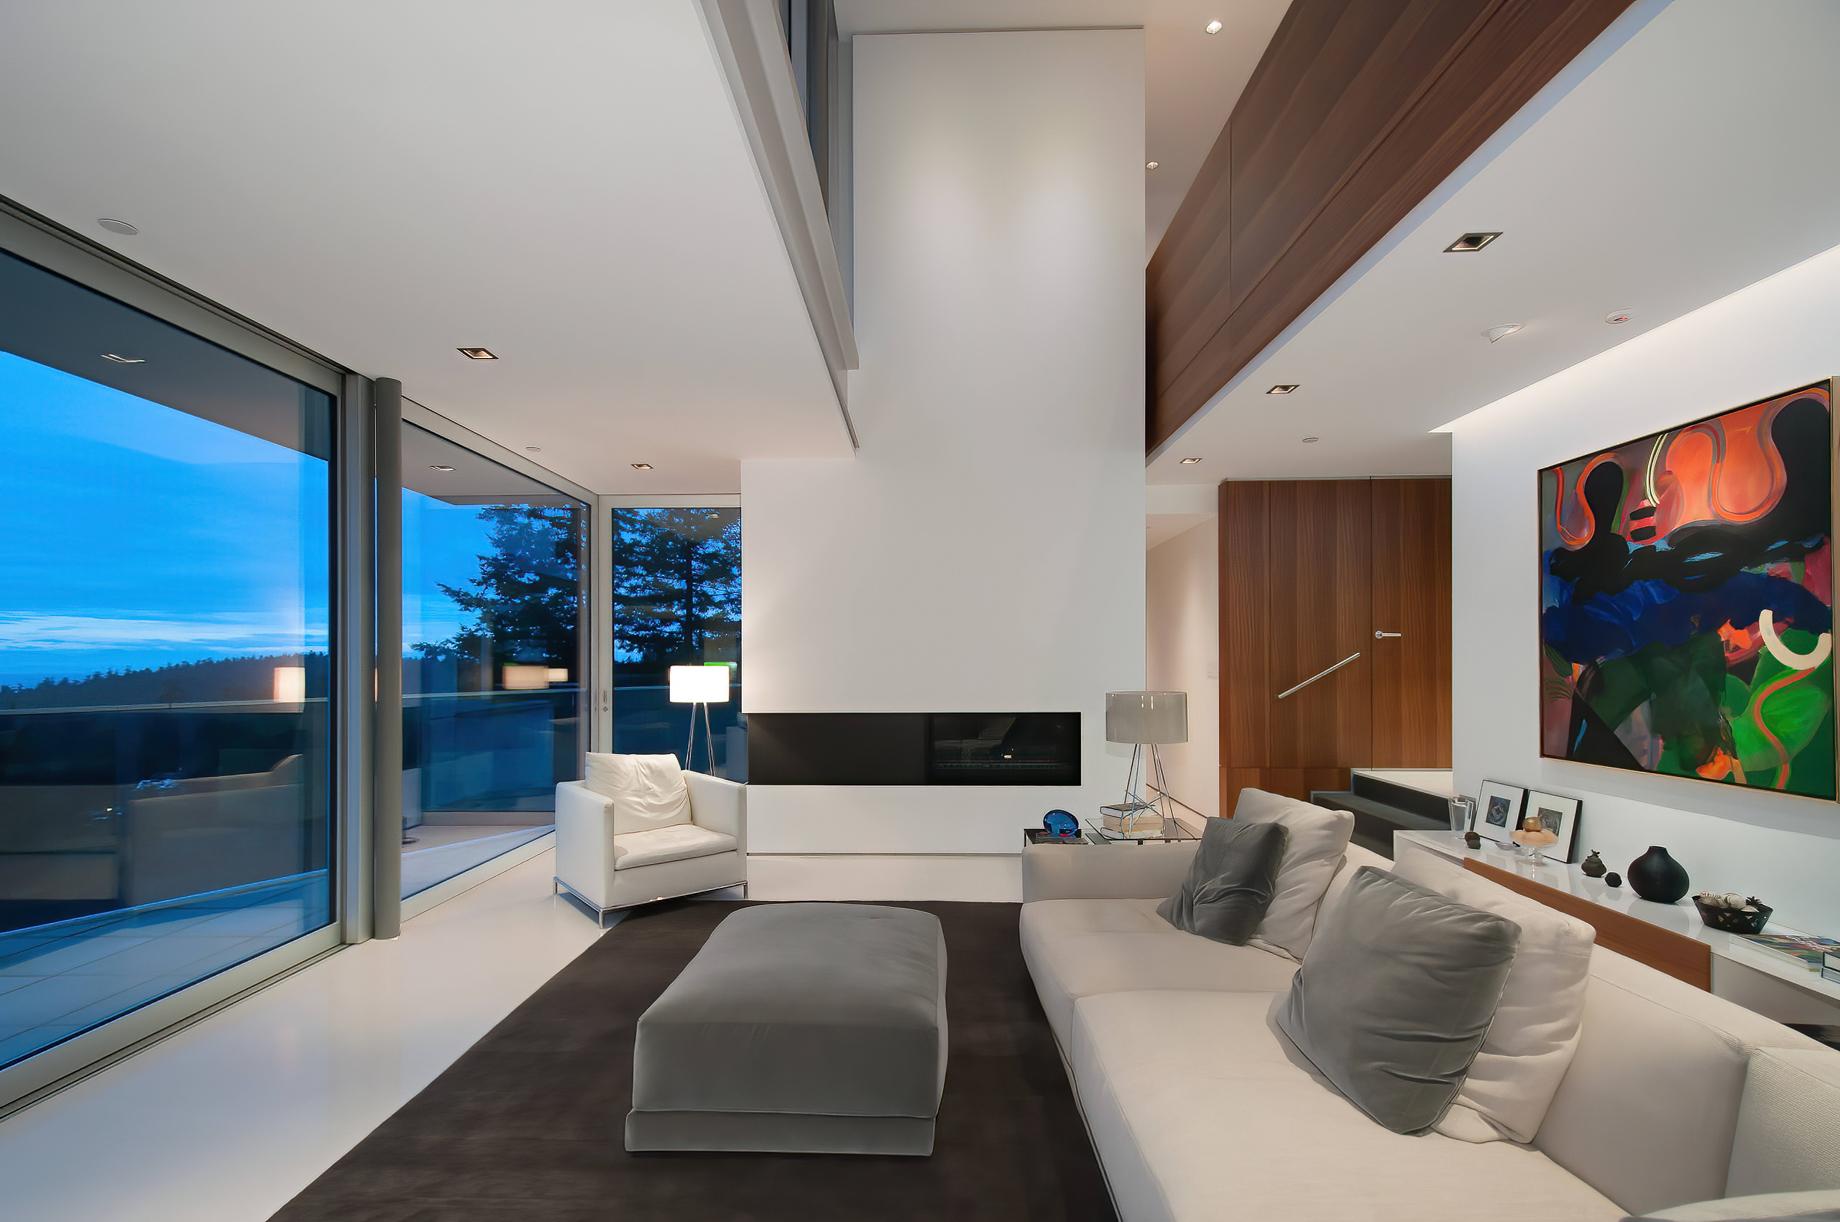 West Coast Modern - 4249 Rockbank Place, West Vancouver, BC, Canada